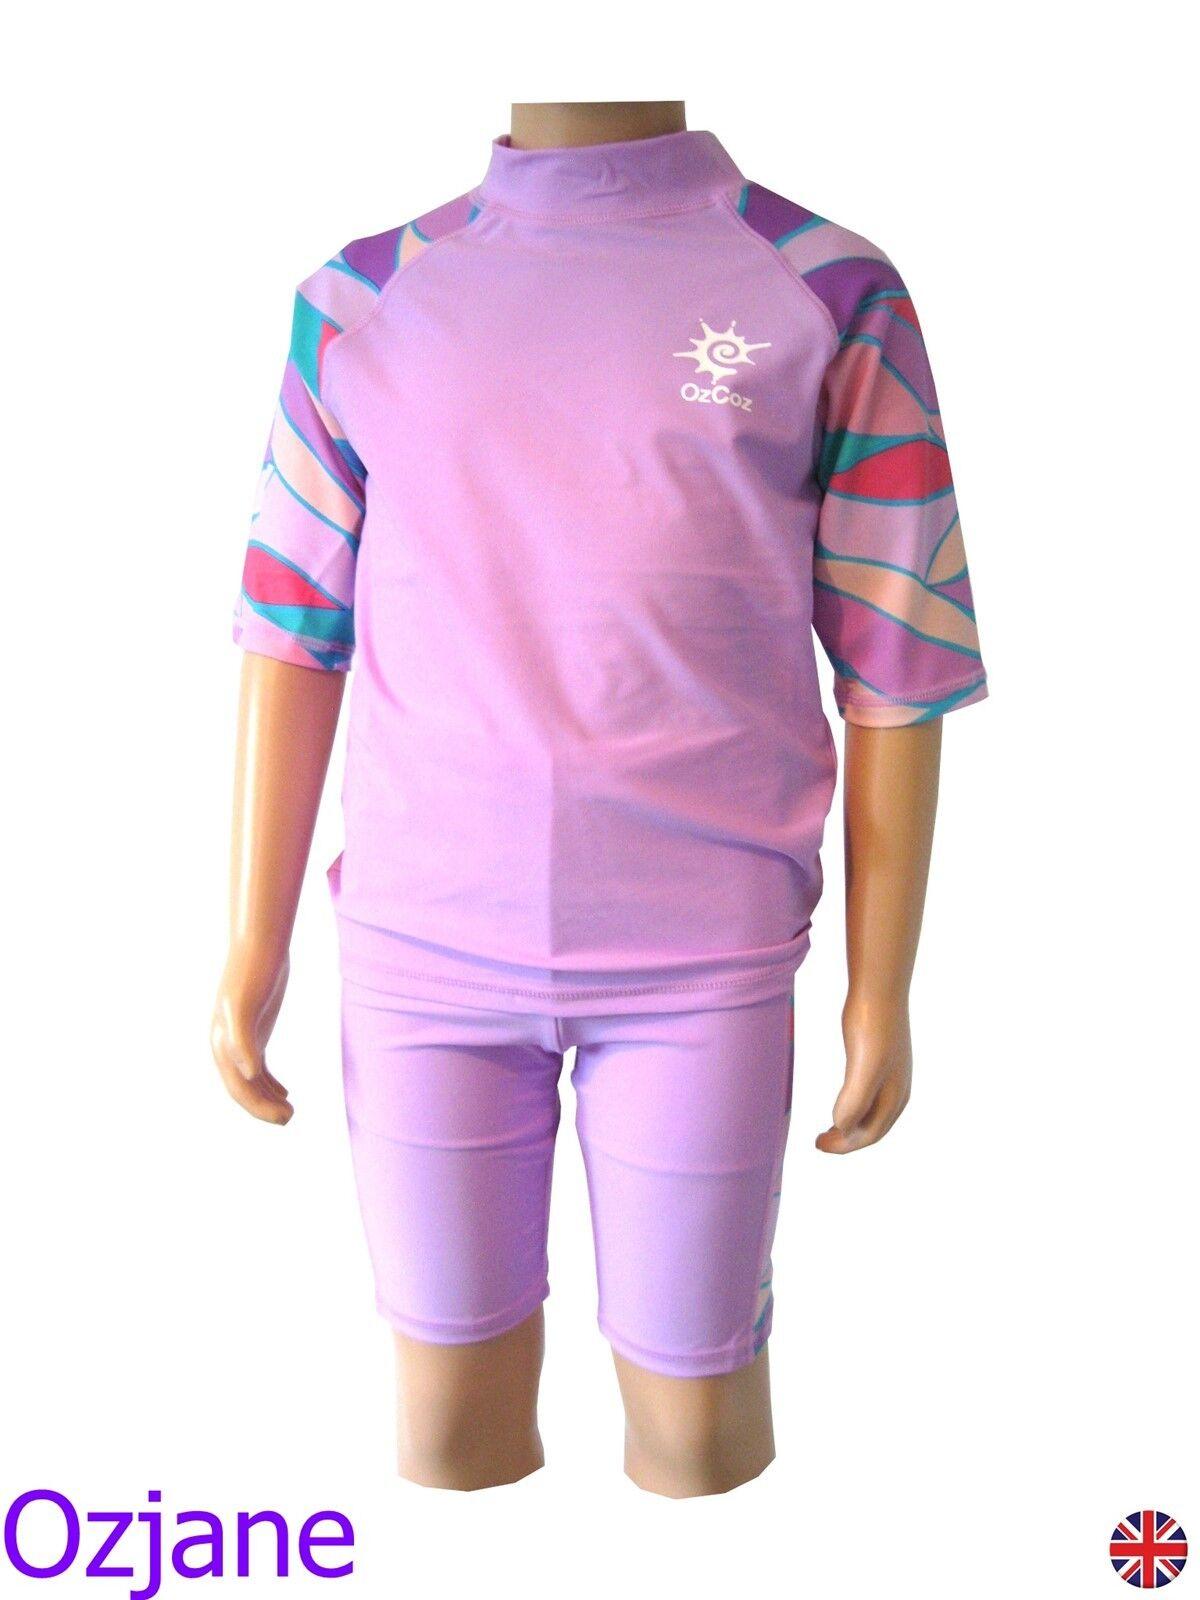 OZCOZ SWIM HAT SUN PROTECTION LEGIONNAIRE PINK 1 TO 2 YRS BABY GIRLS UV 50